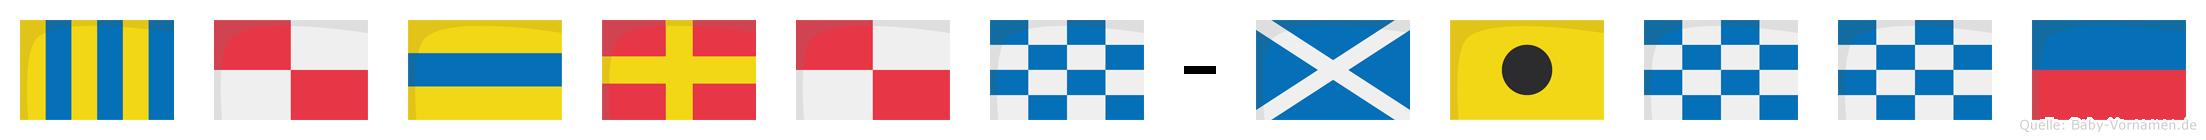 Gudrun-Minne im Flaggenalphabet